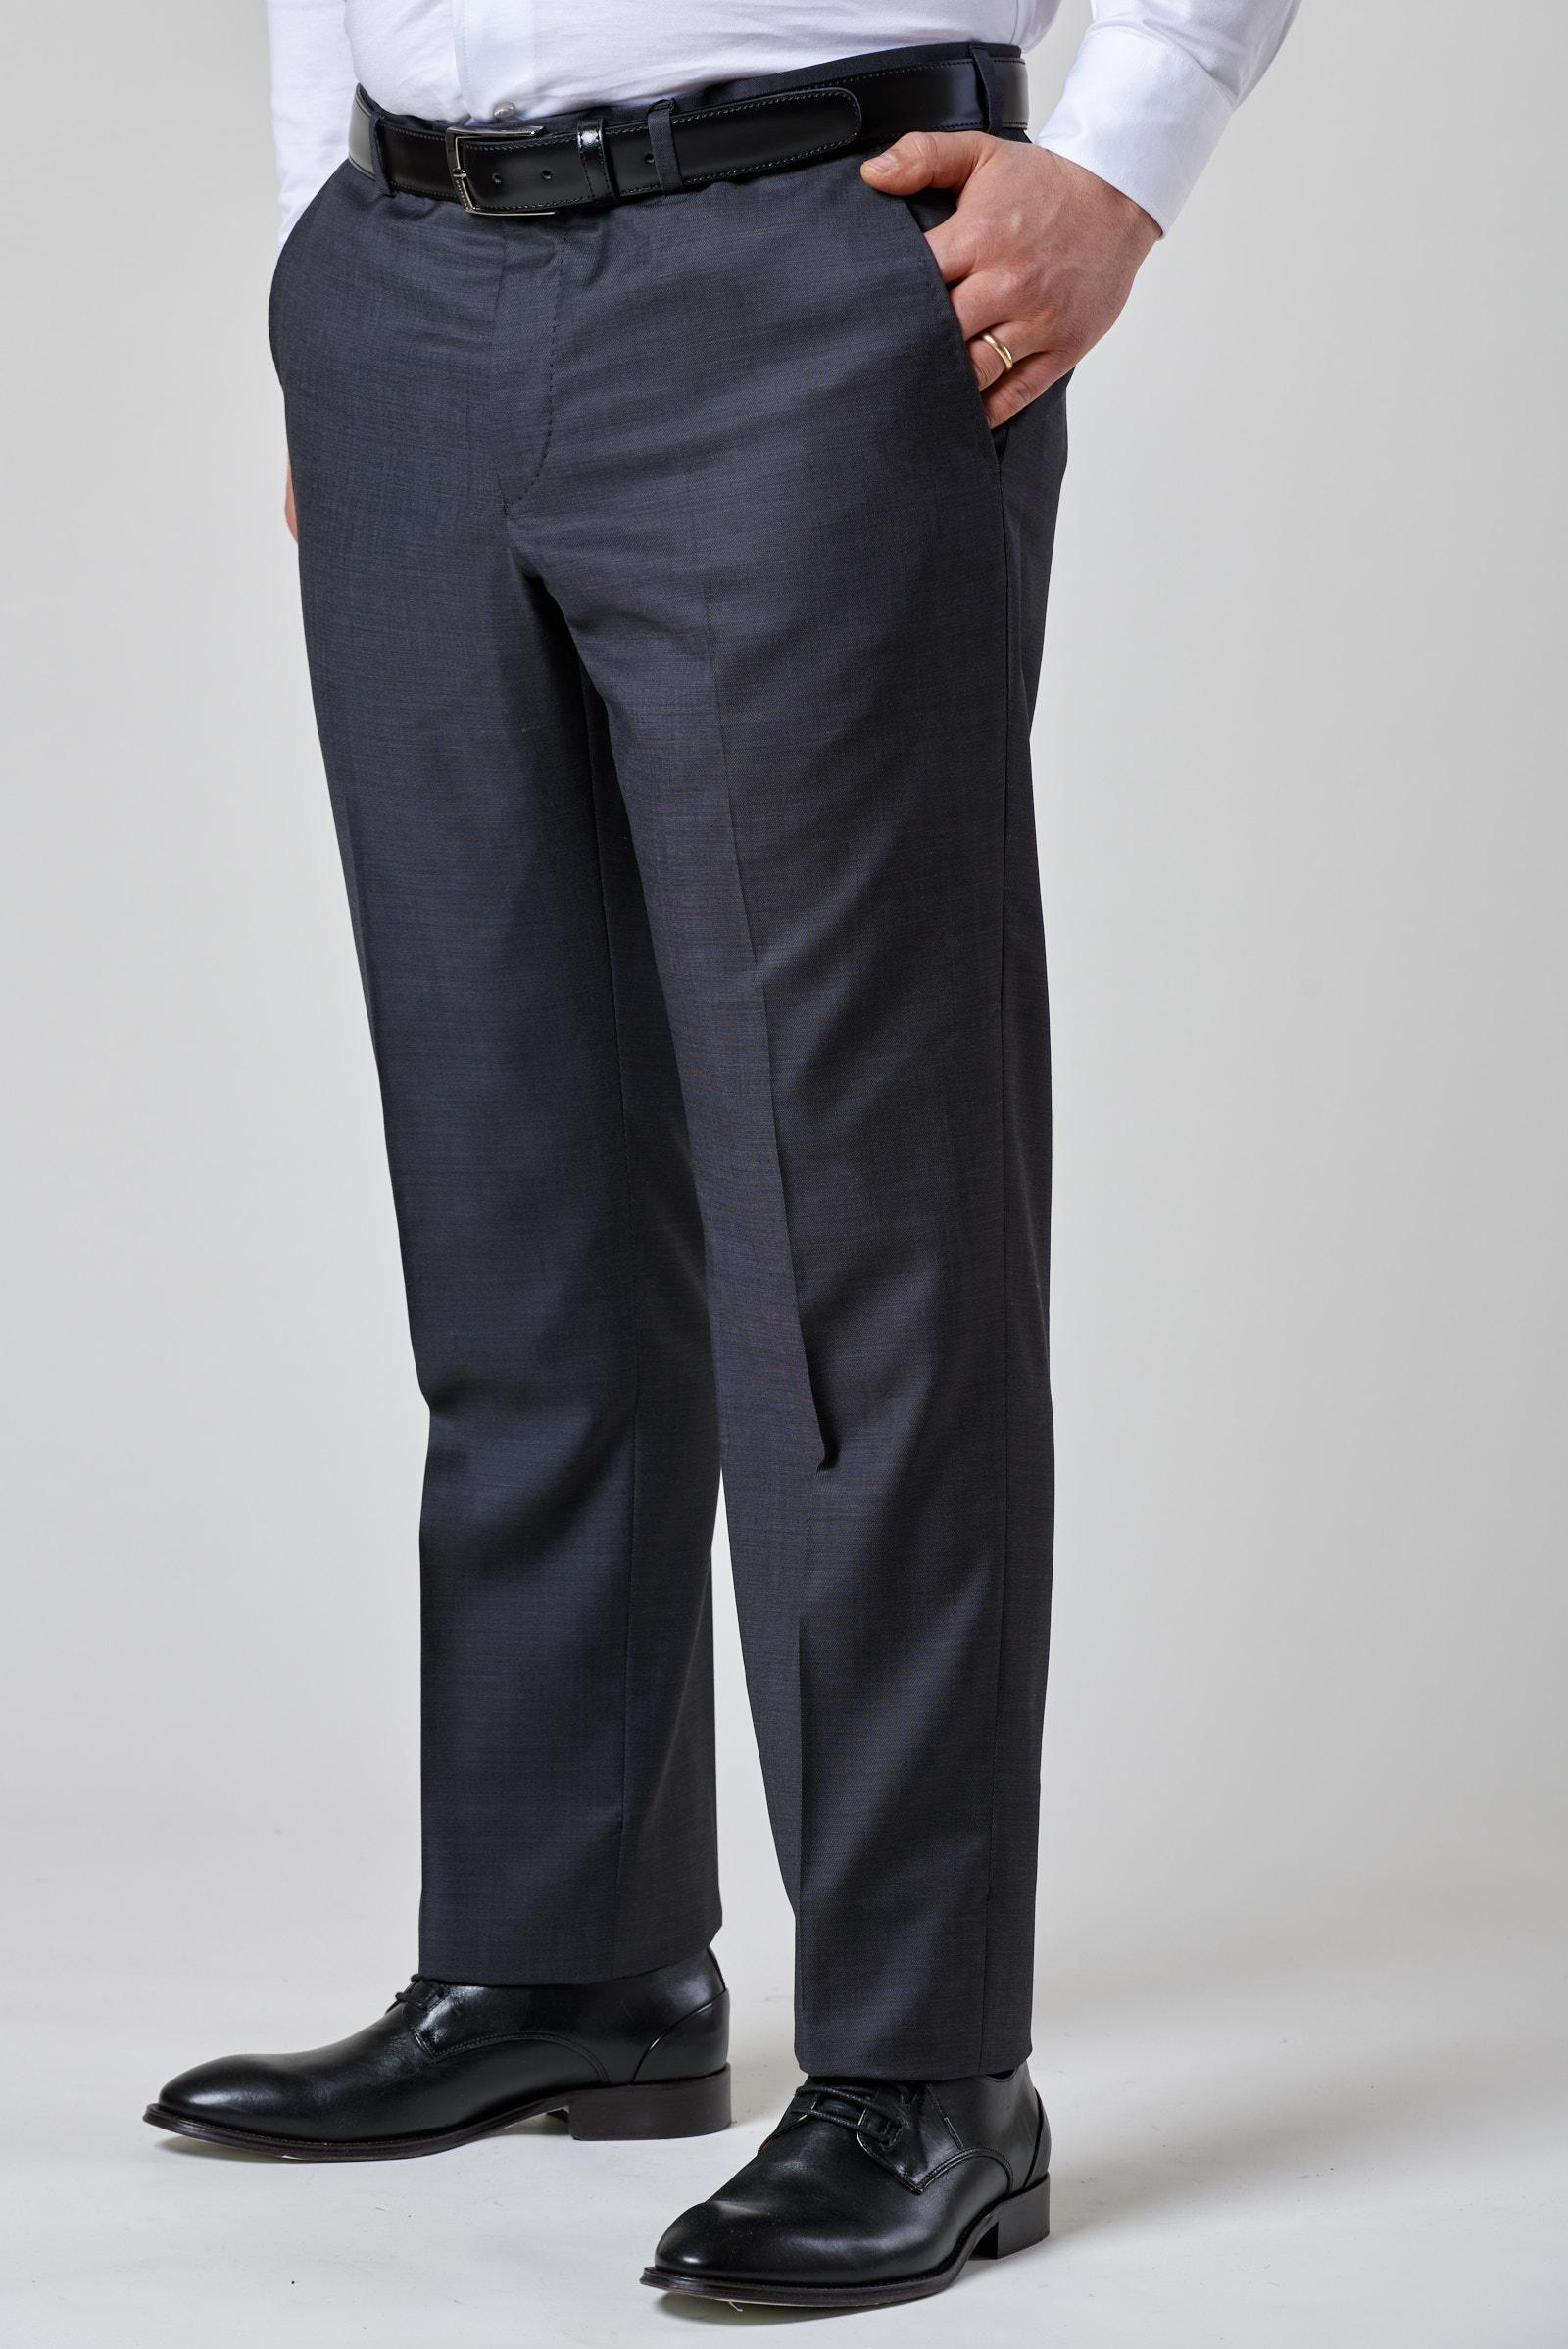 Angelico Pantalone grigio scuro armatura 140s comodo ...